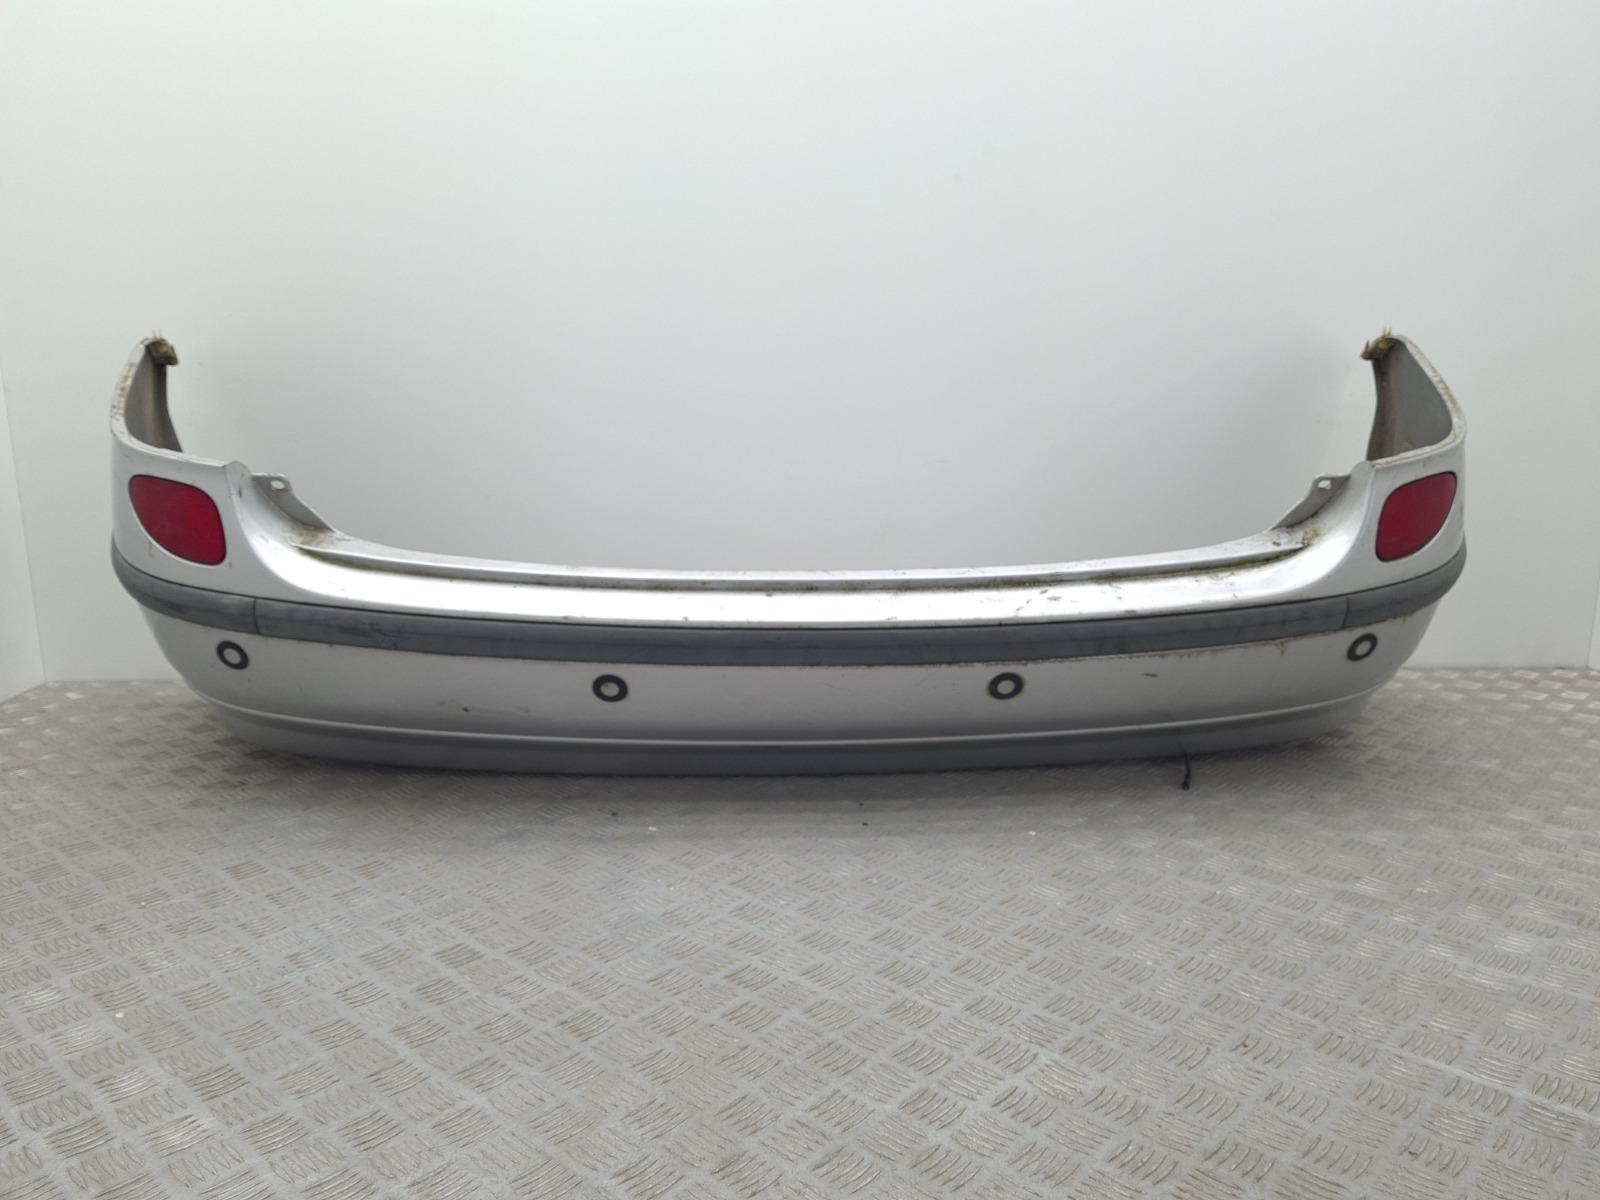 Бампер задний Nissan Almera Tino 2.0 I 2002 (б/у)